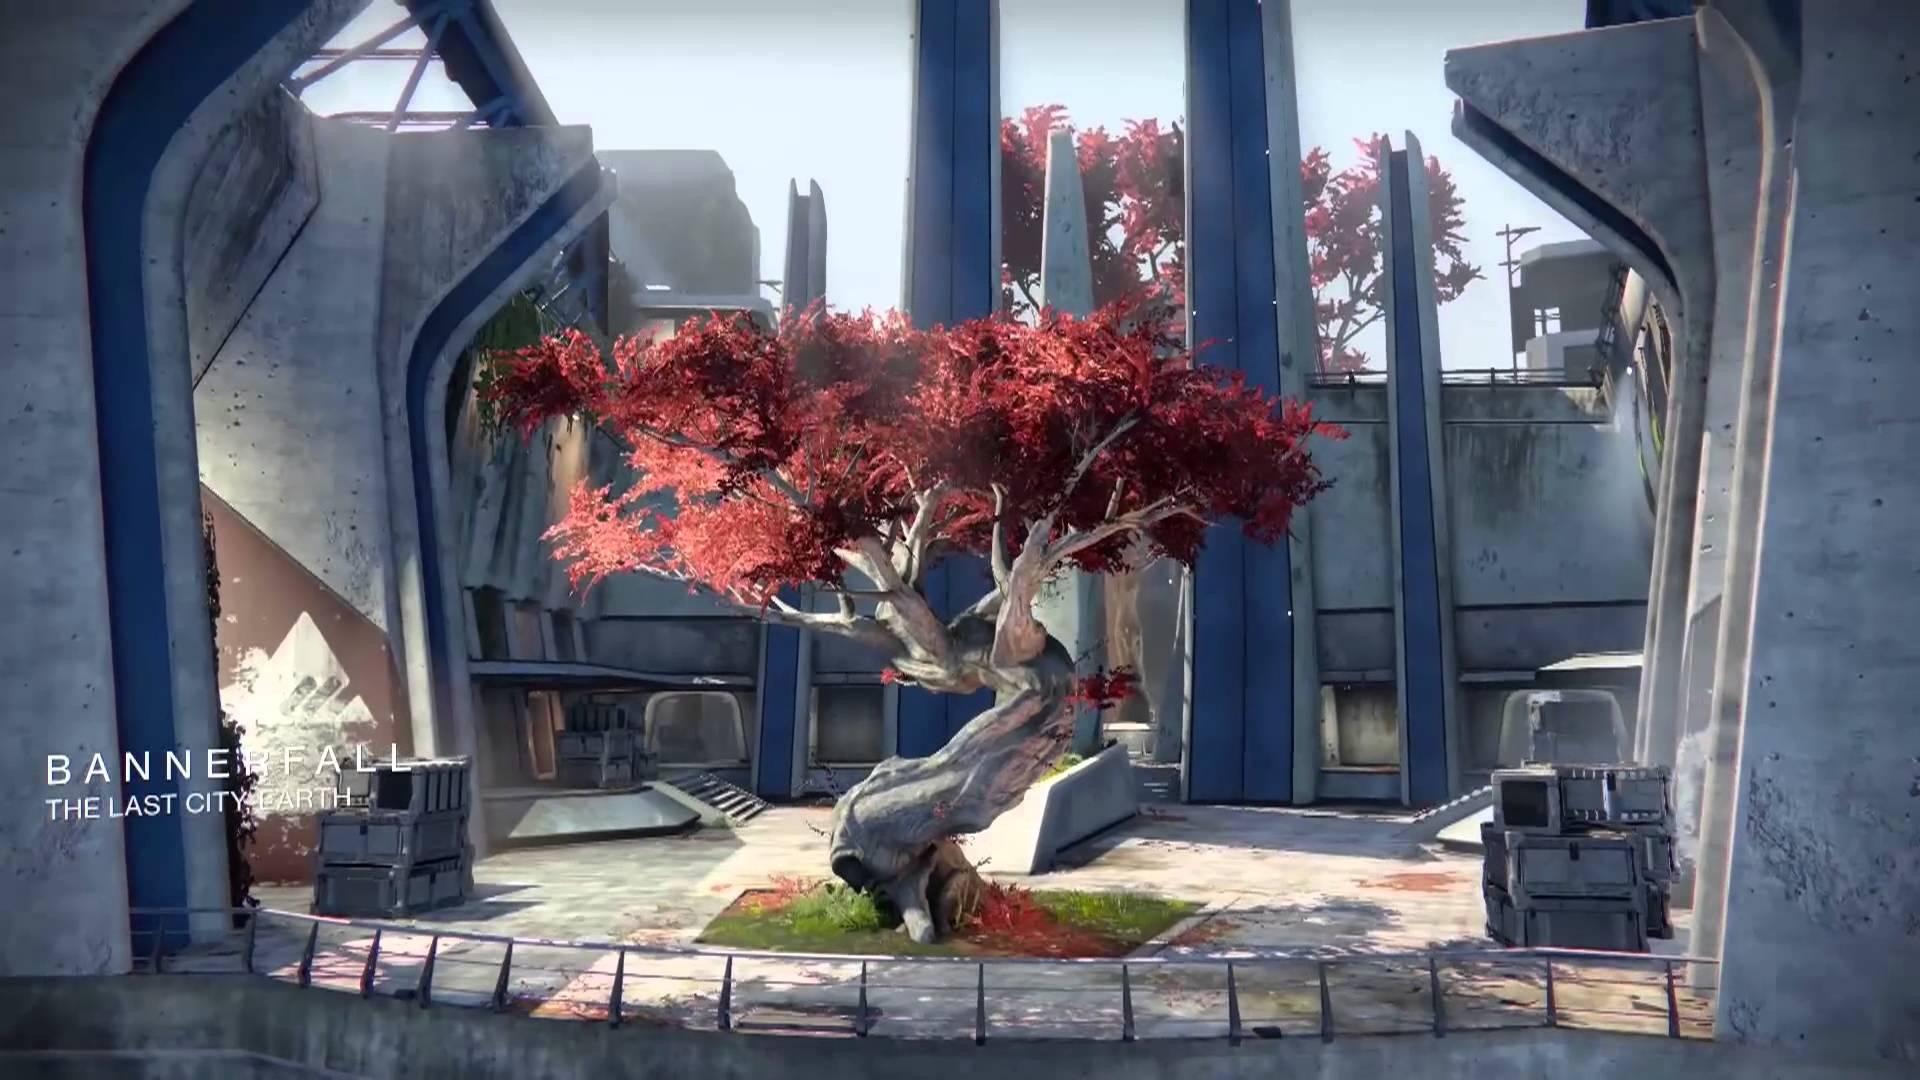 Destiny Bannerfall